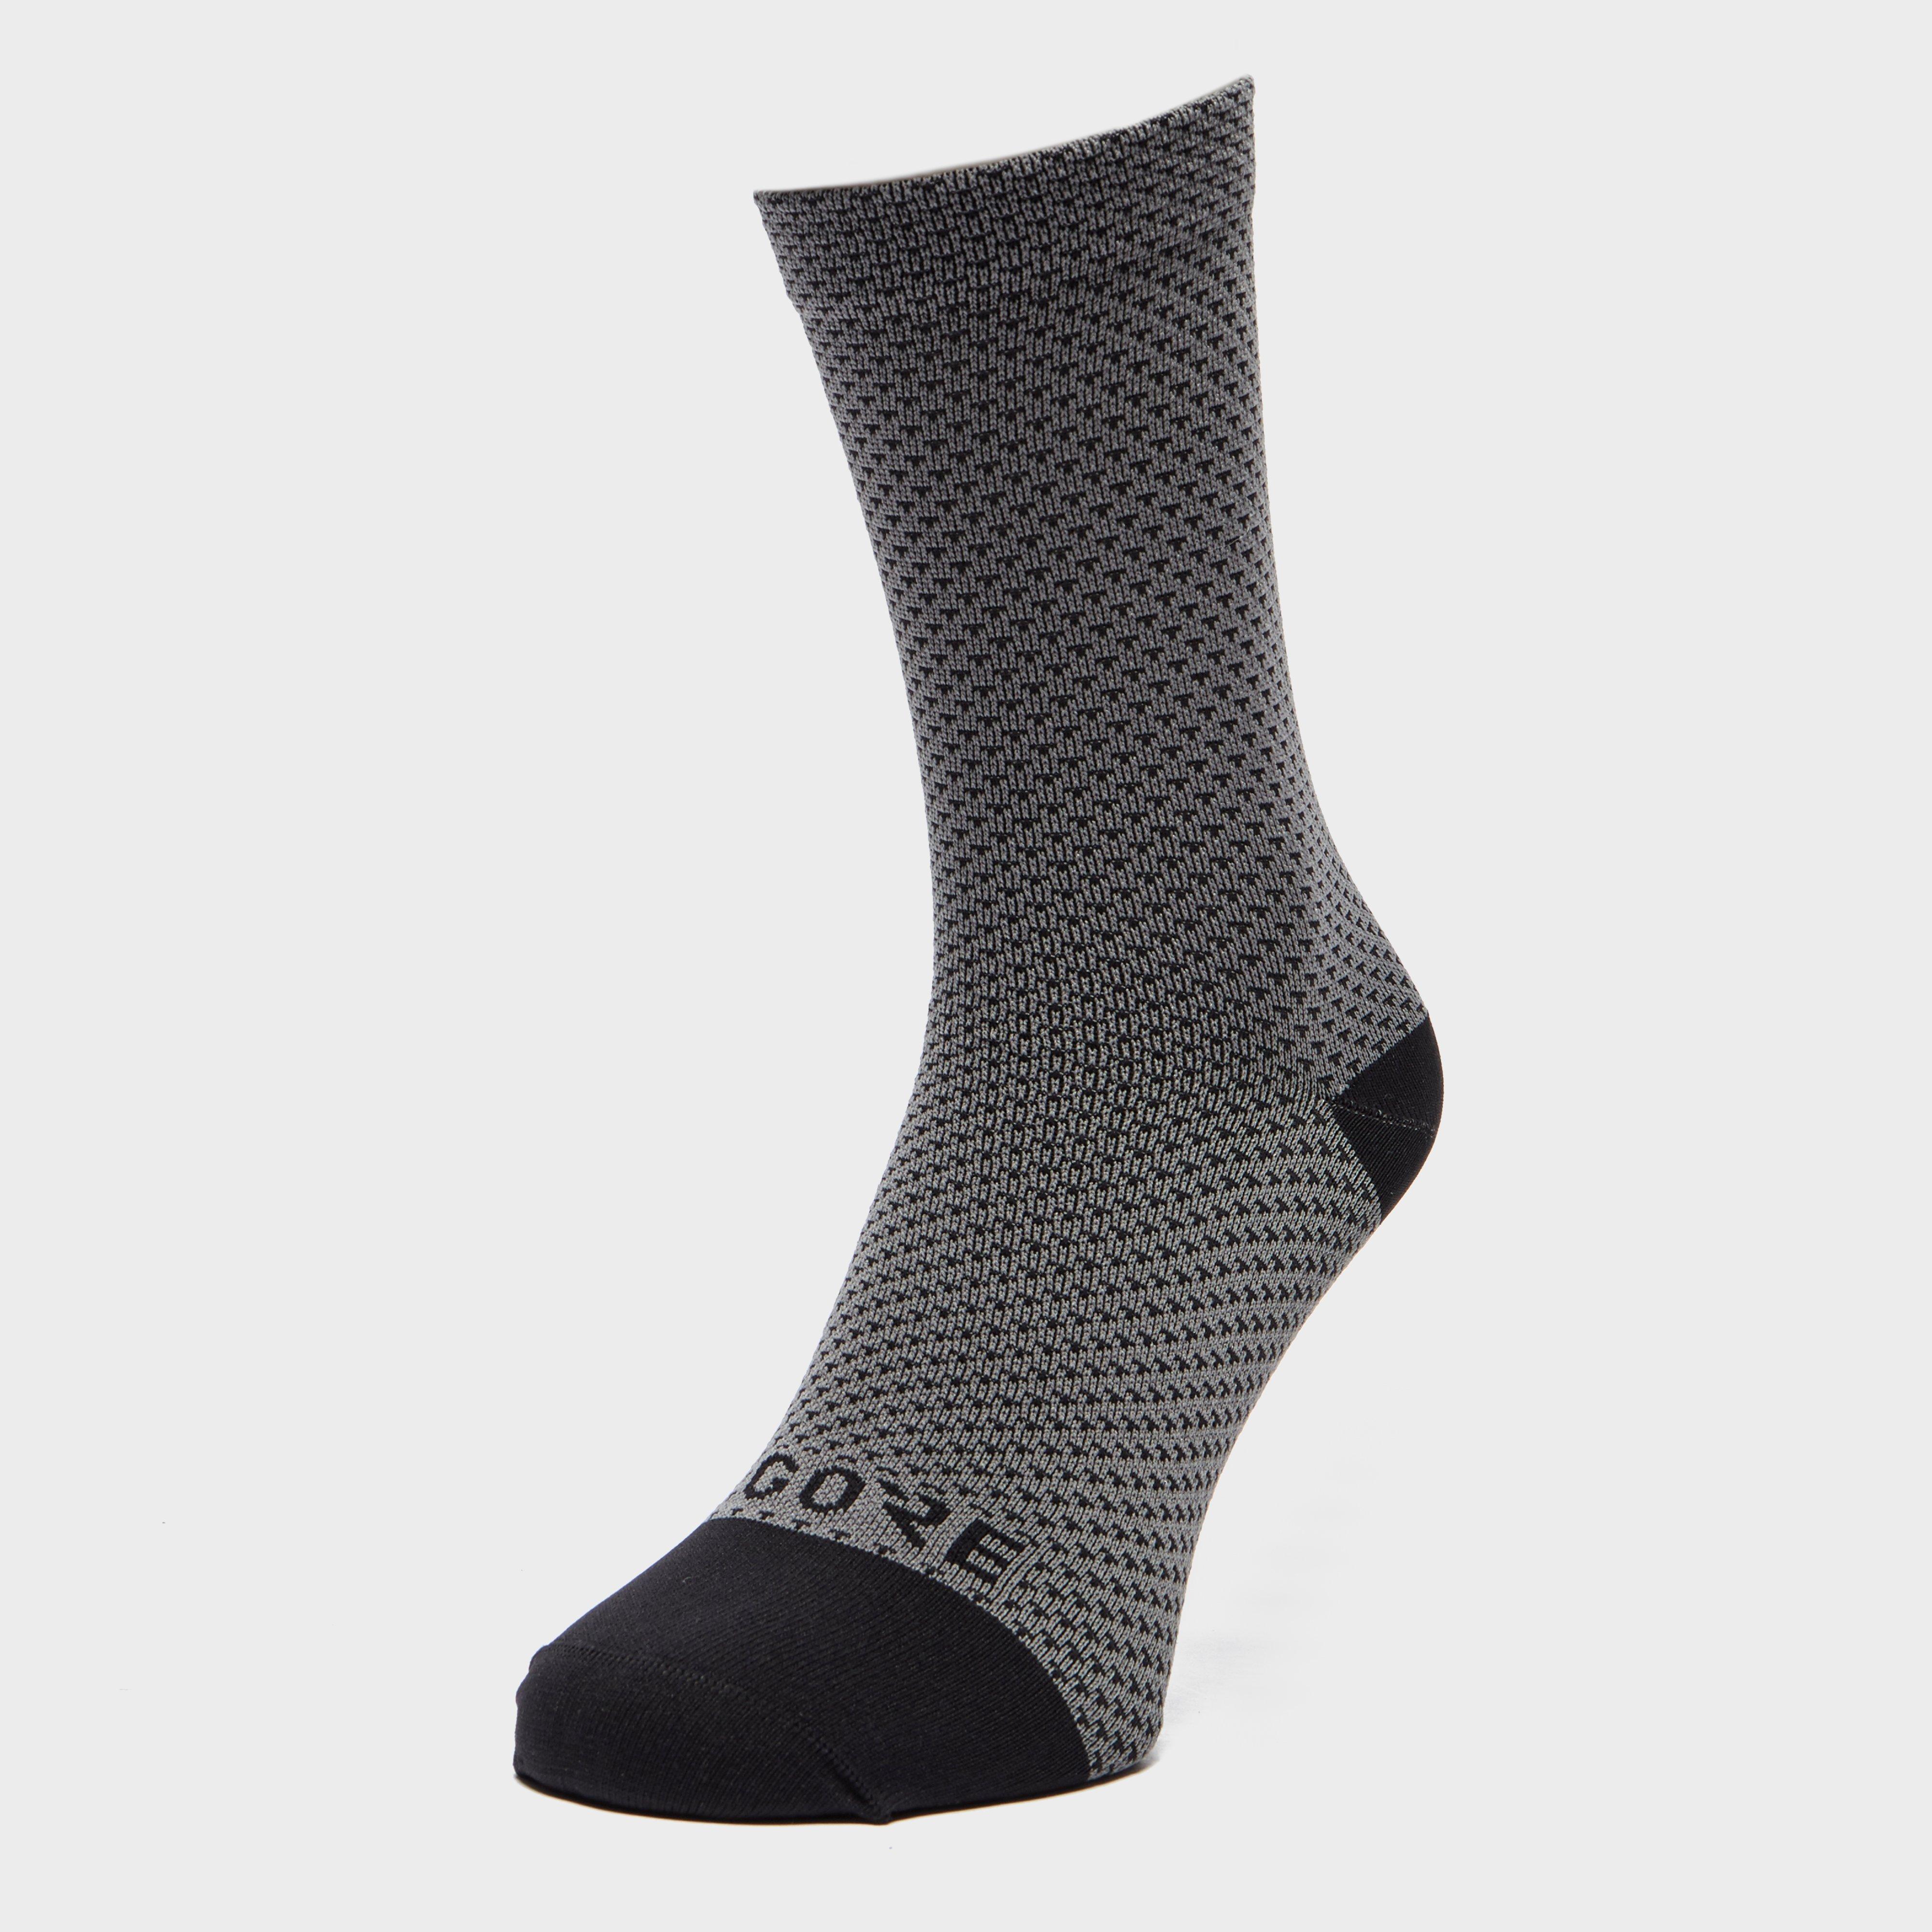 Gore Men's C3 Dot Mid Socks - Grey, Grey